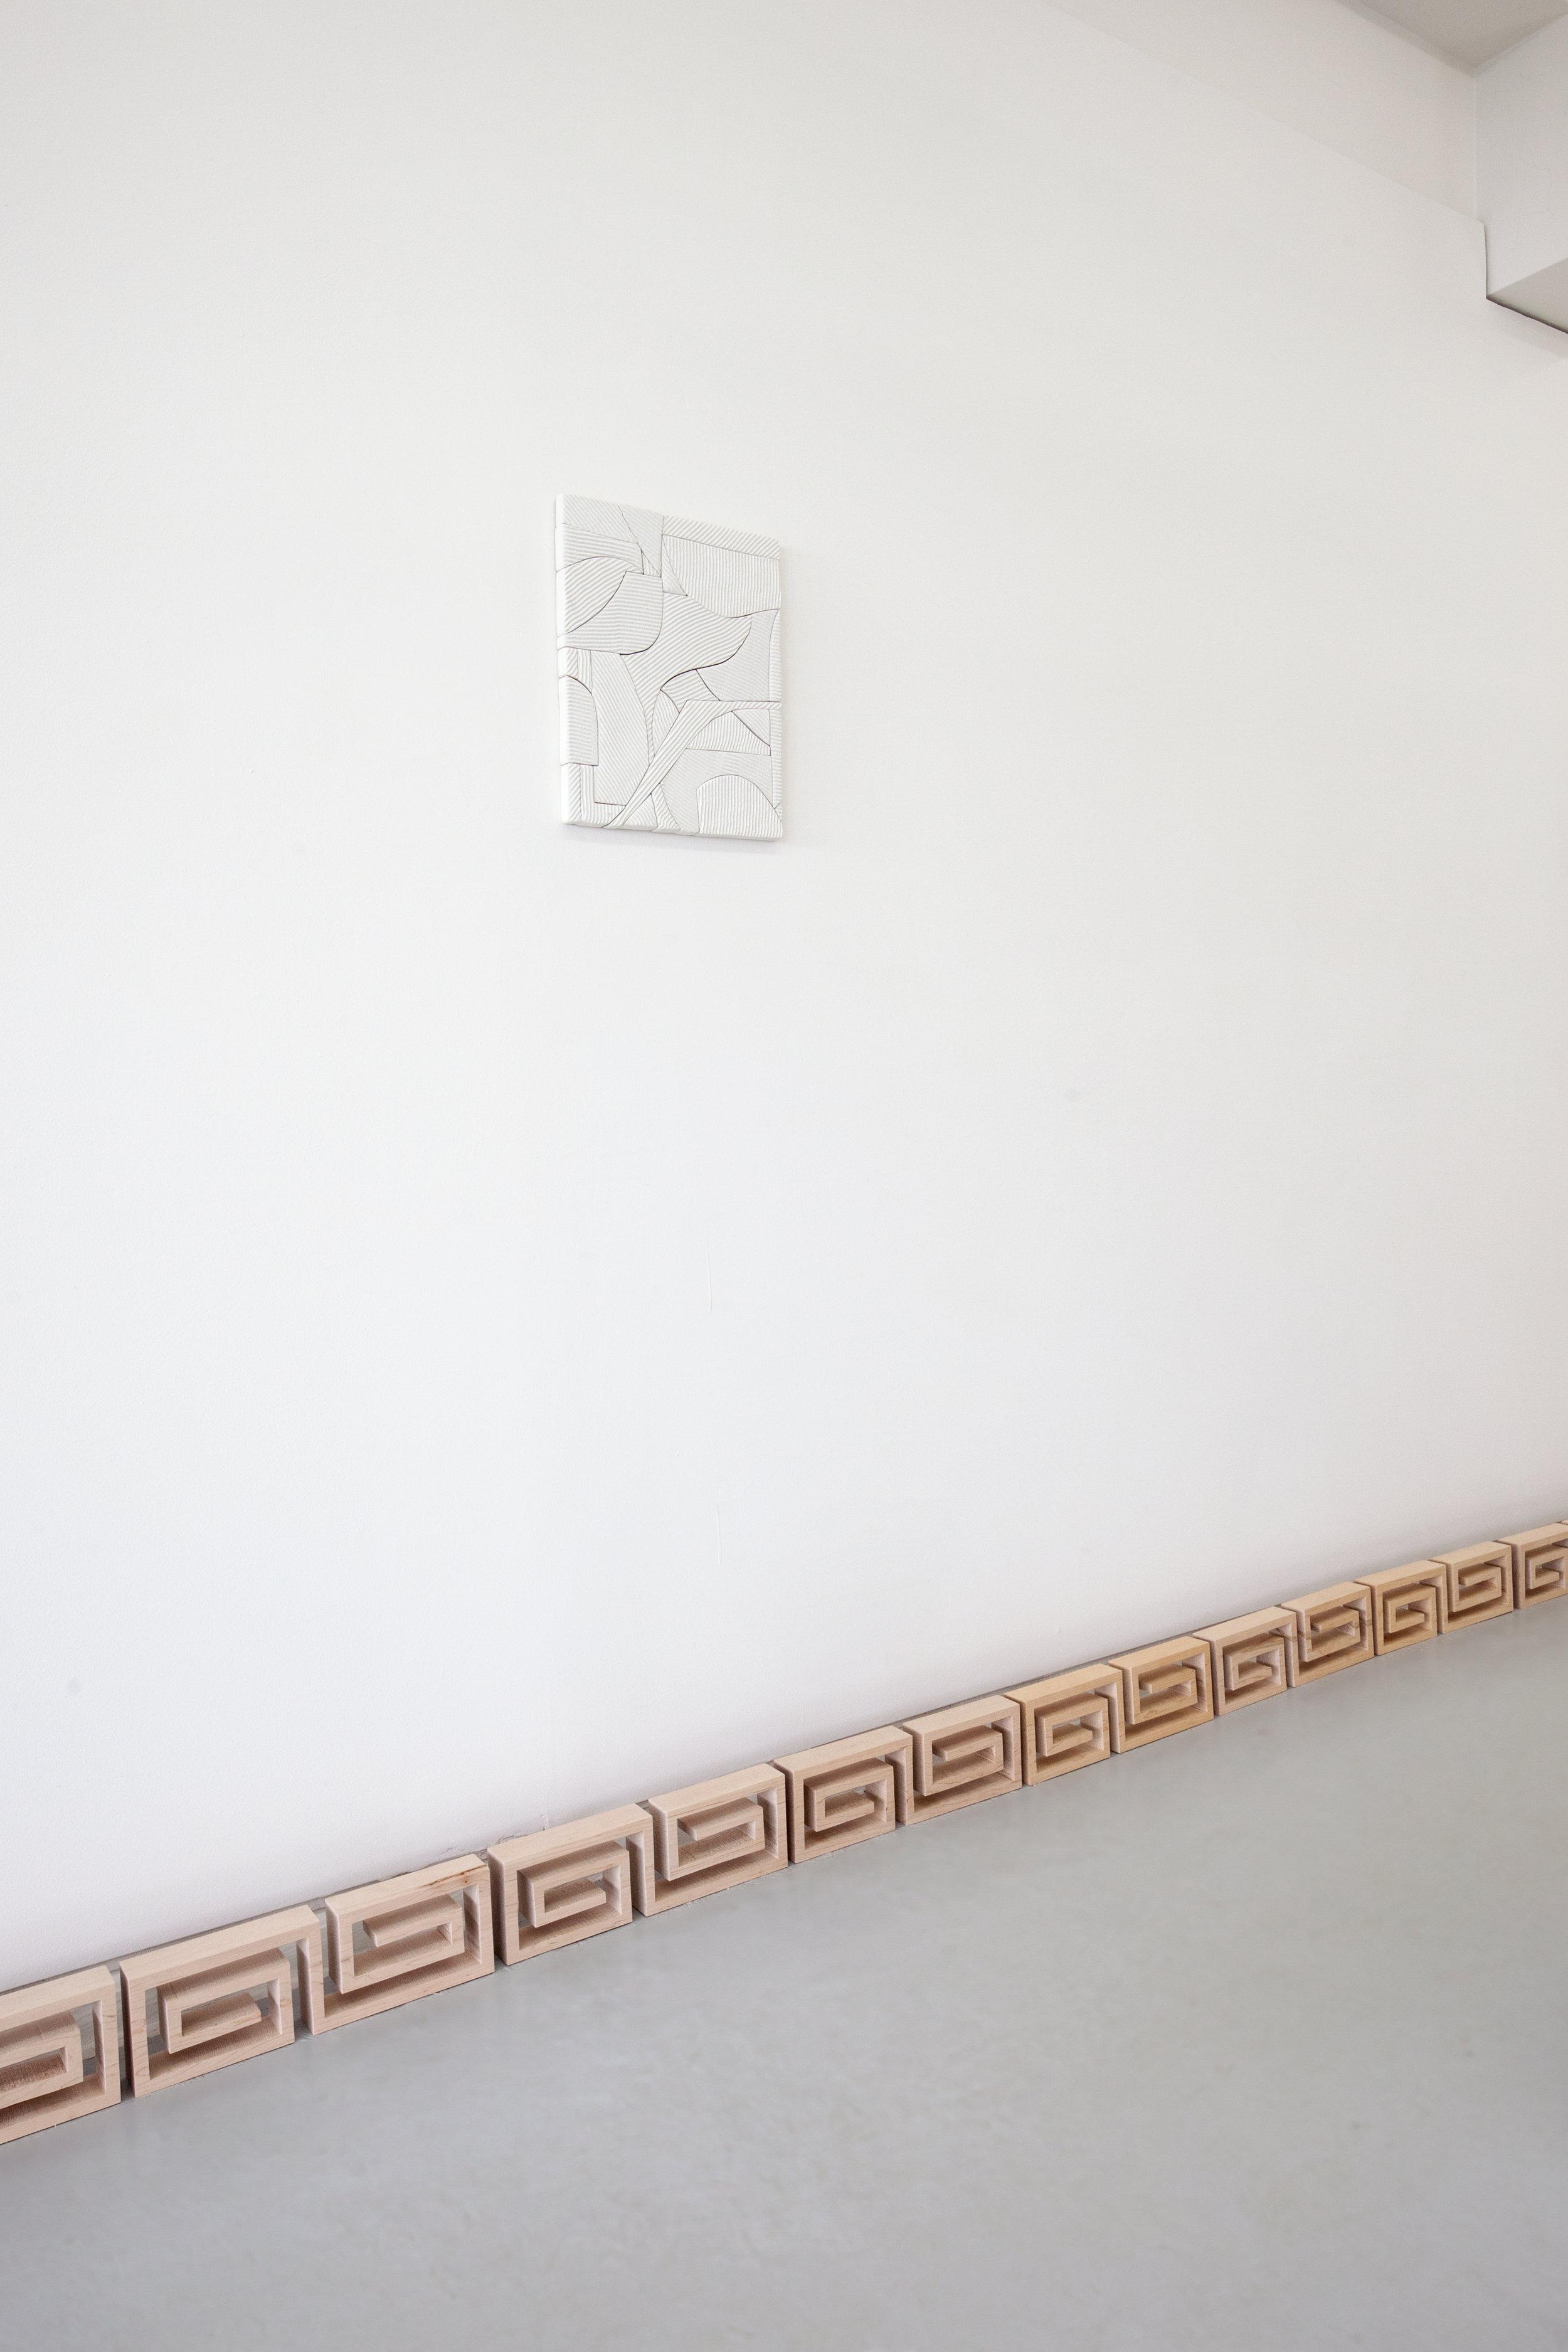 Elizabeth_Atterbury-Night_Comes_In-Installation_View_010.jpg